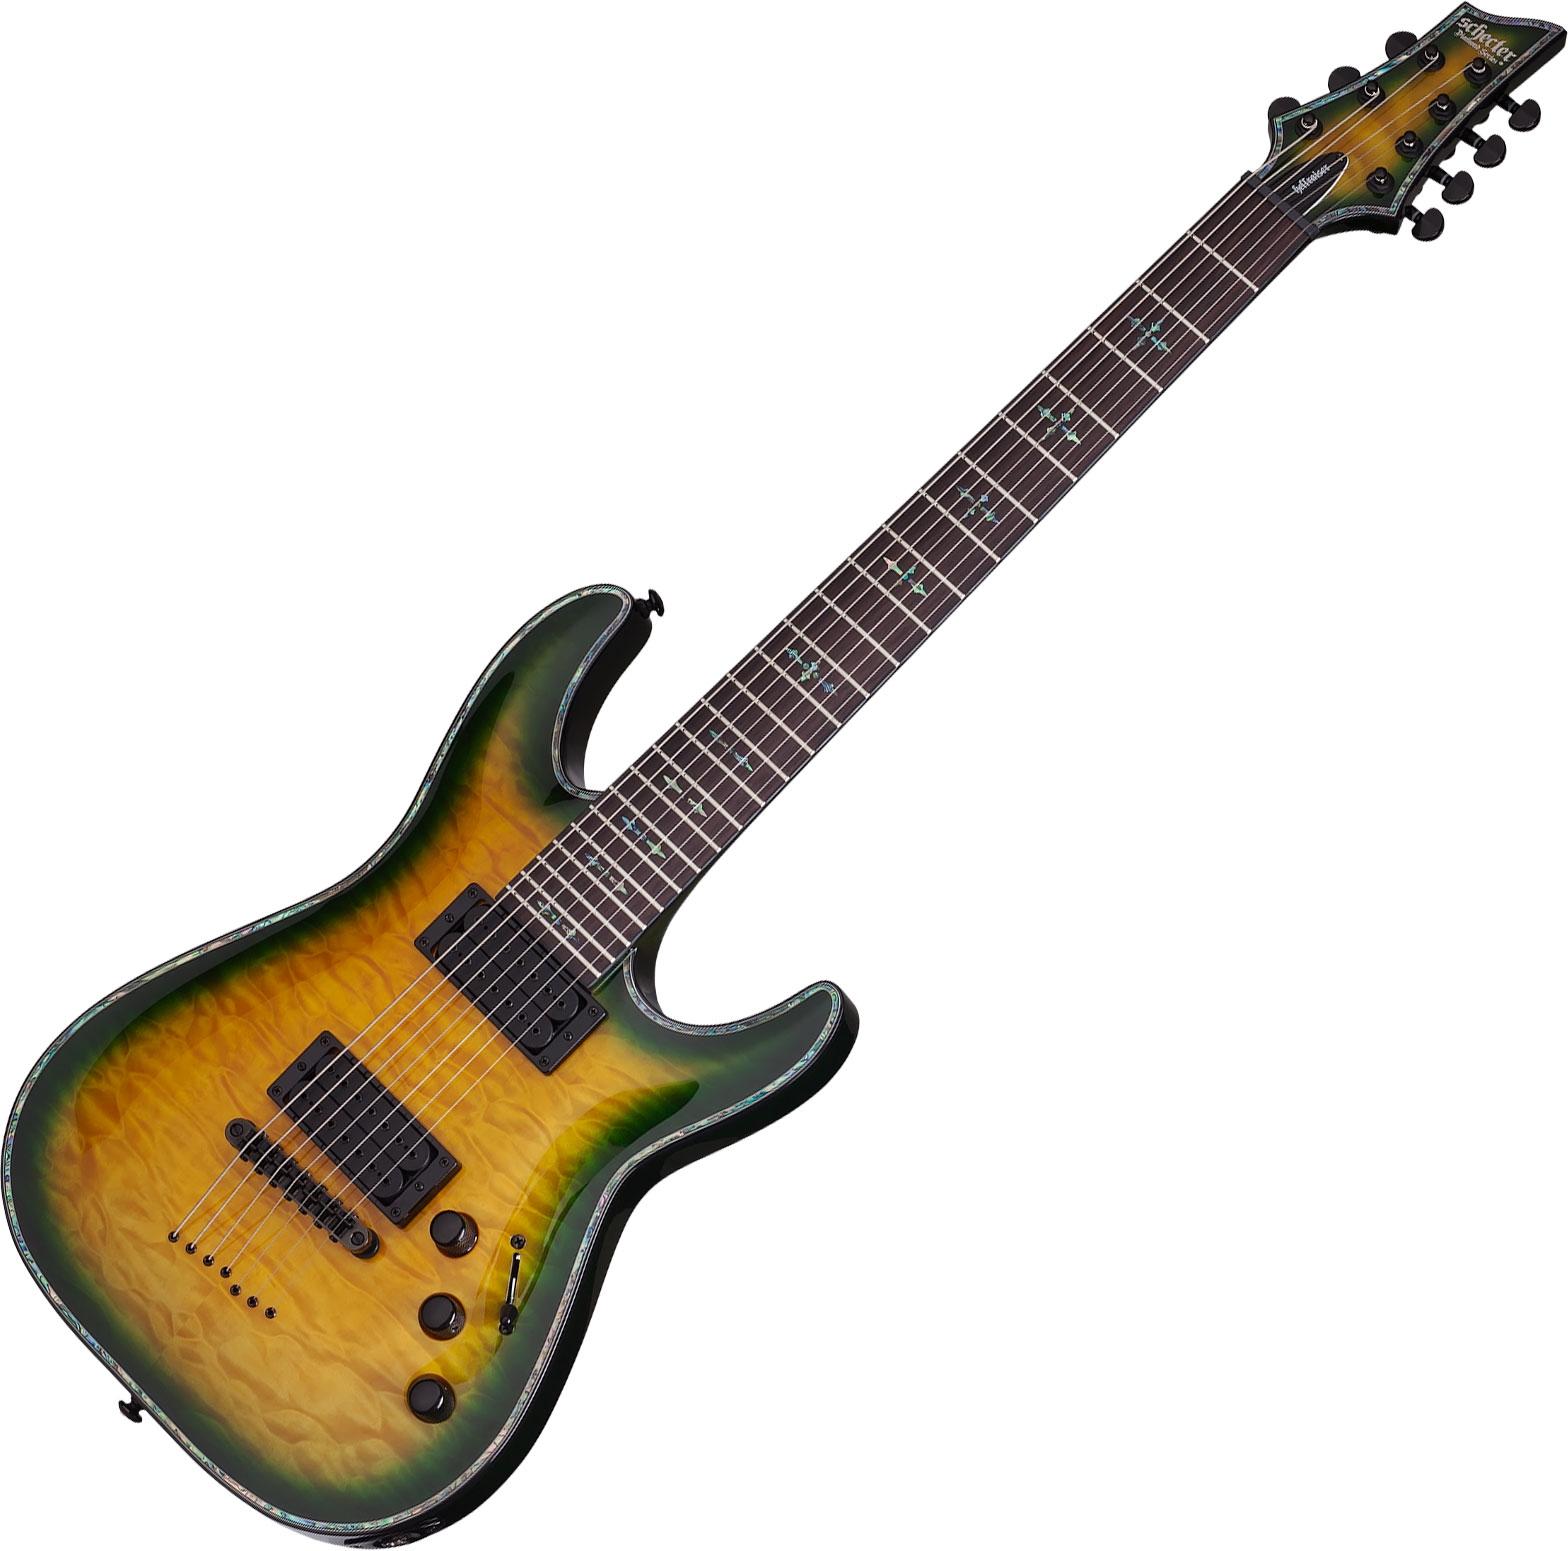 schecter hellraiser c 7 passive electric guitar in dragon burst finish 815447021583 ebay. Black Bedroom Furniture Sets. Home Design Ideas